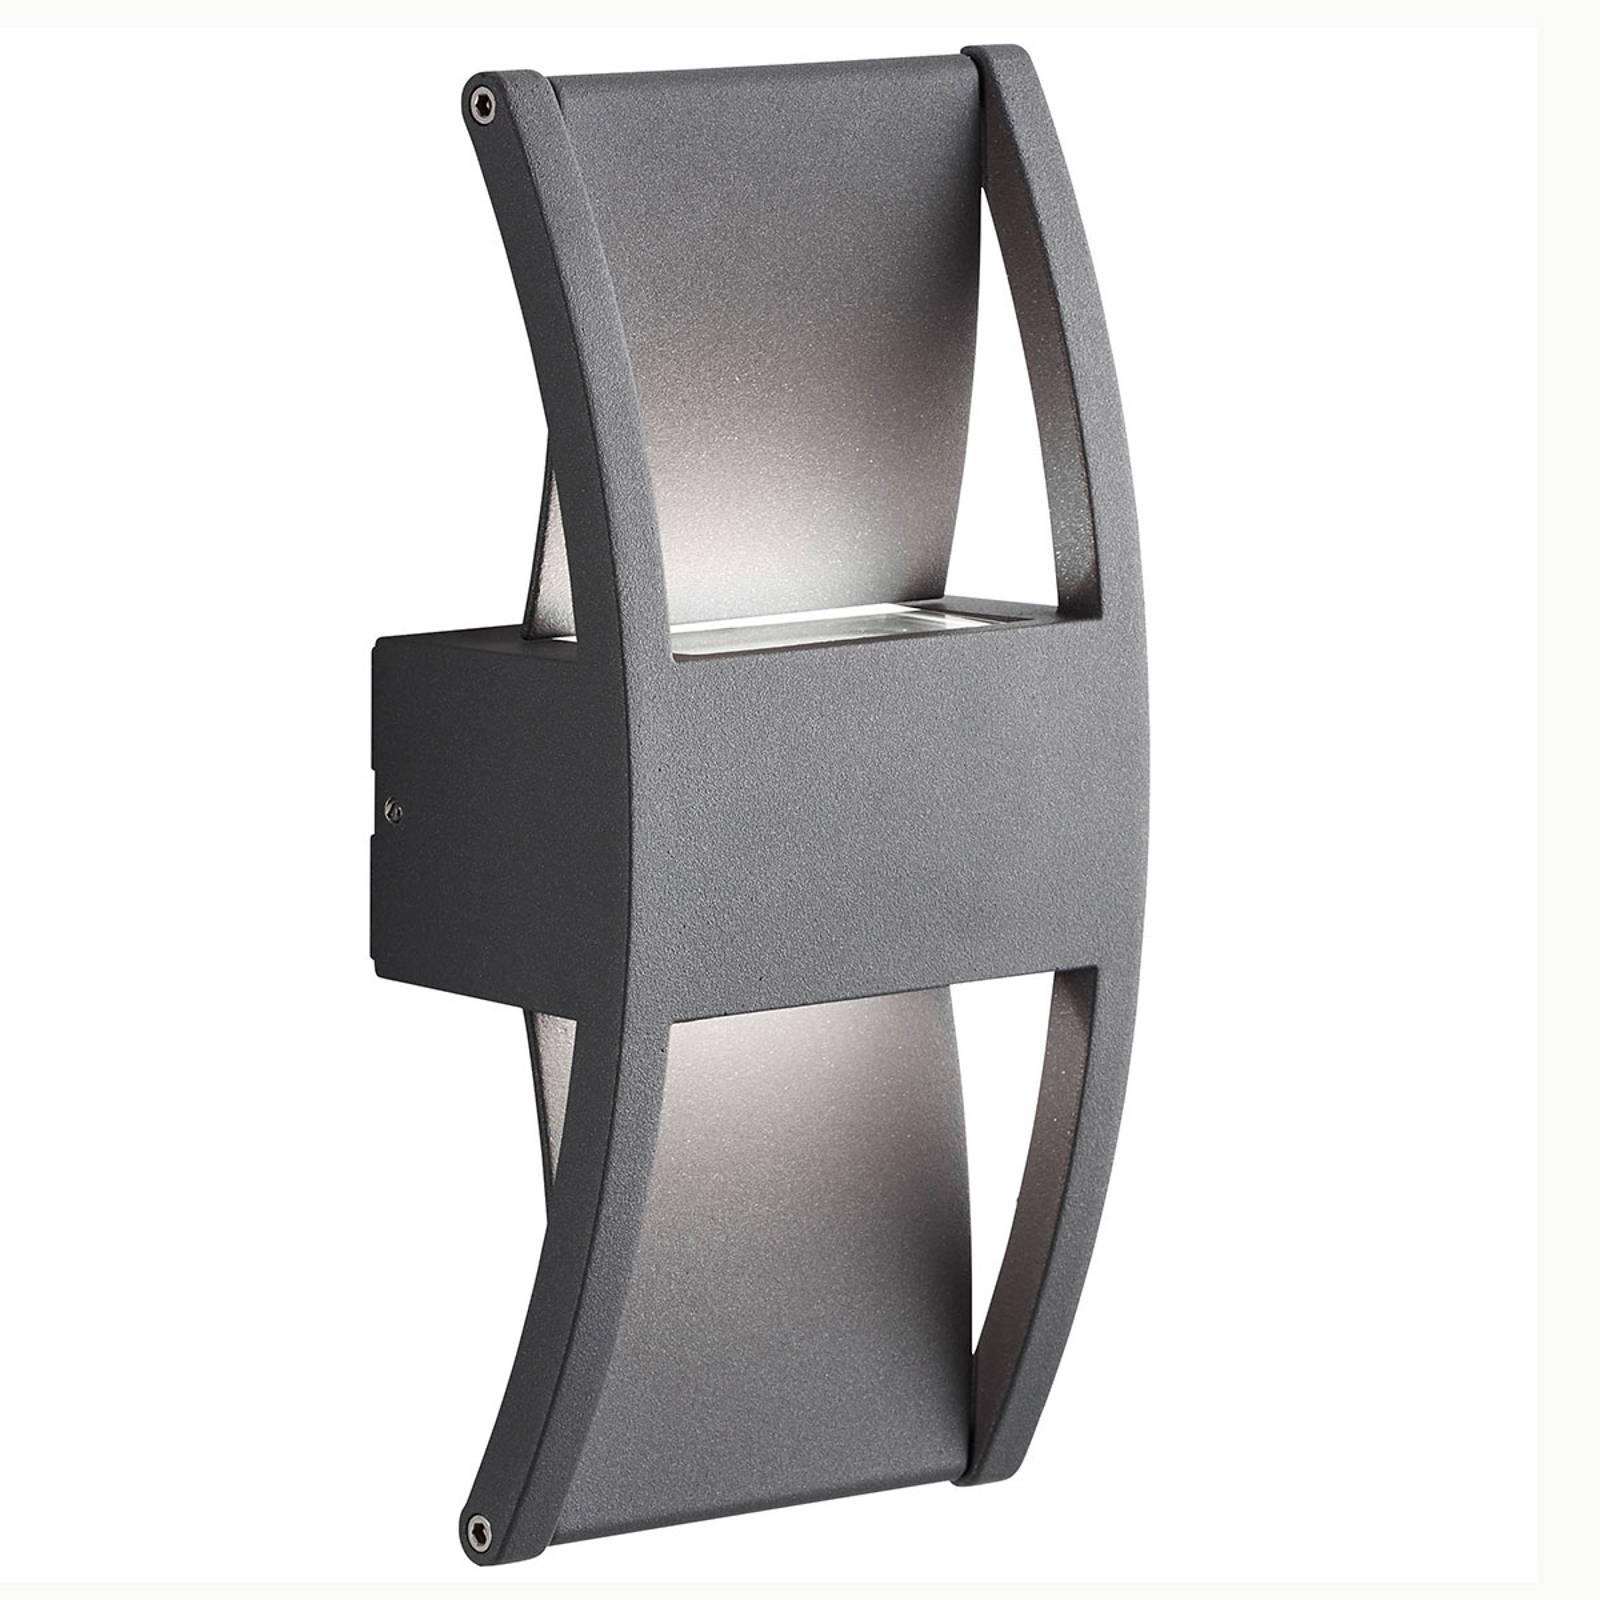 AEG Elroy -LED-ulkoseinälamppu alumiinia